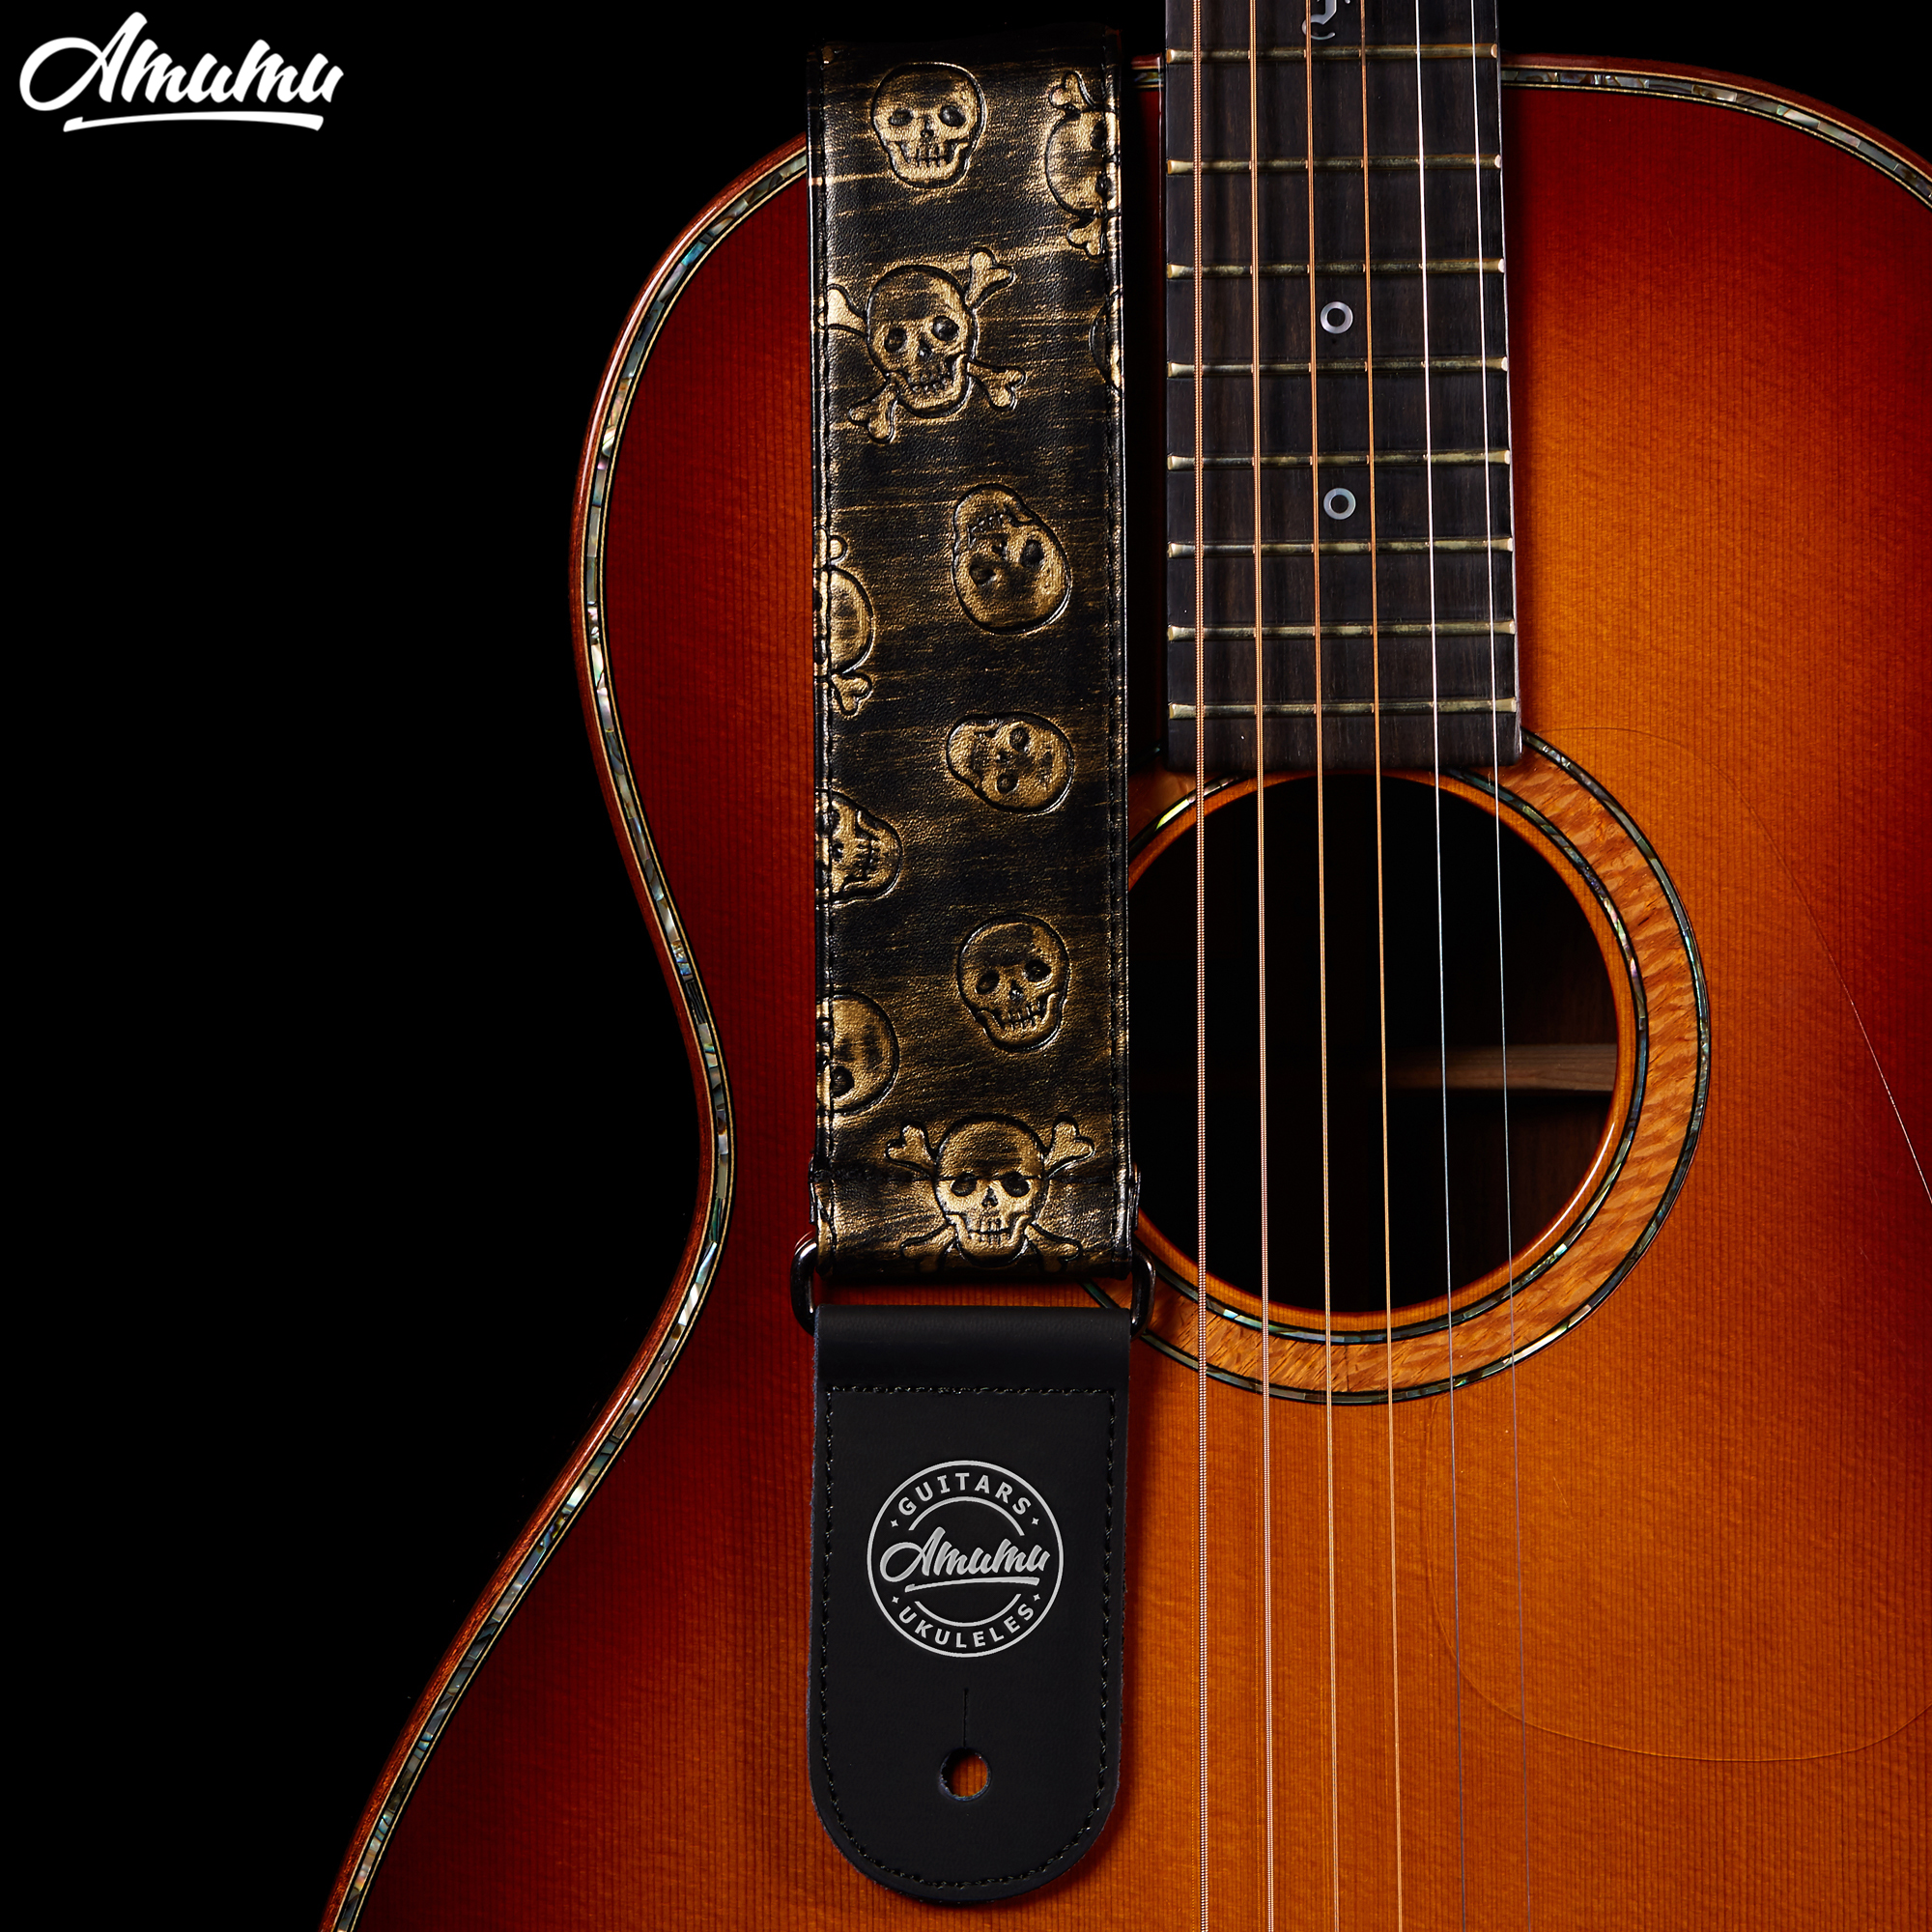 Amumu Bronze PU Leather Guitar Straps Emboss Skull Pattern 5cm Width for Folk Acoustic Electric Guitar 93-163cm Length S532-1 amumu traditional weaving patterns cotton guitar strap for classical acoustic folk guitar guitar belt s113